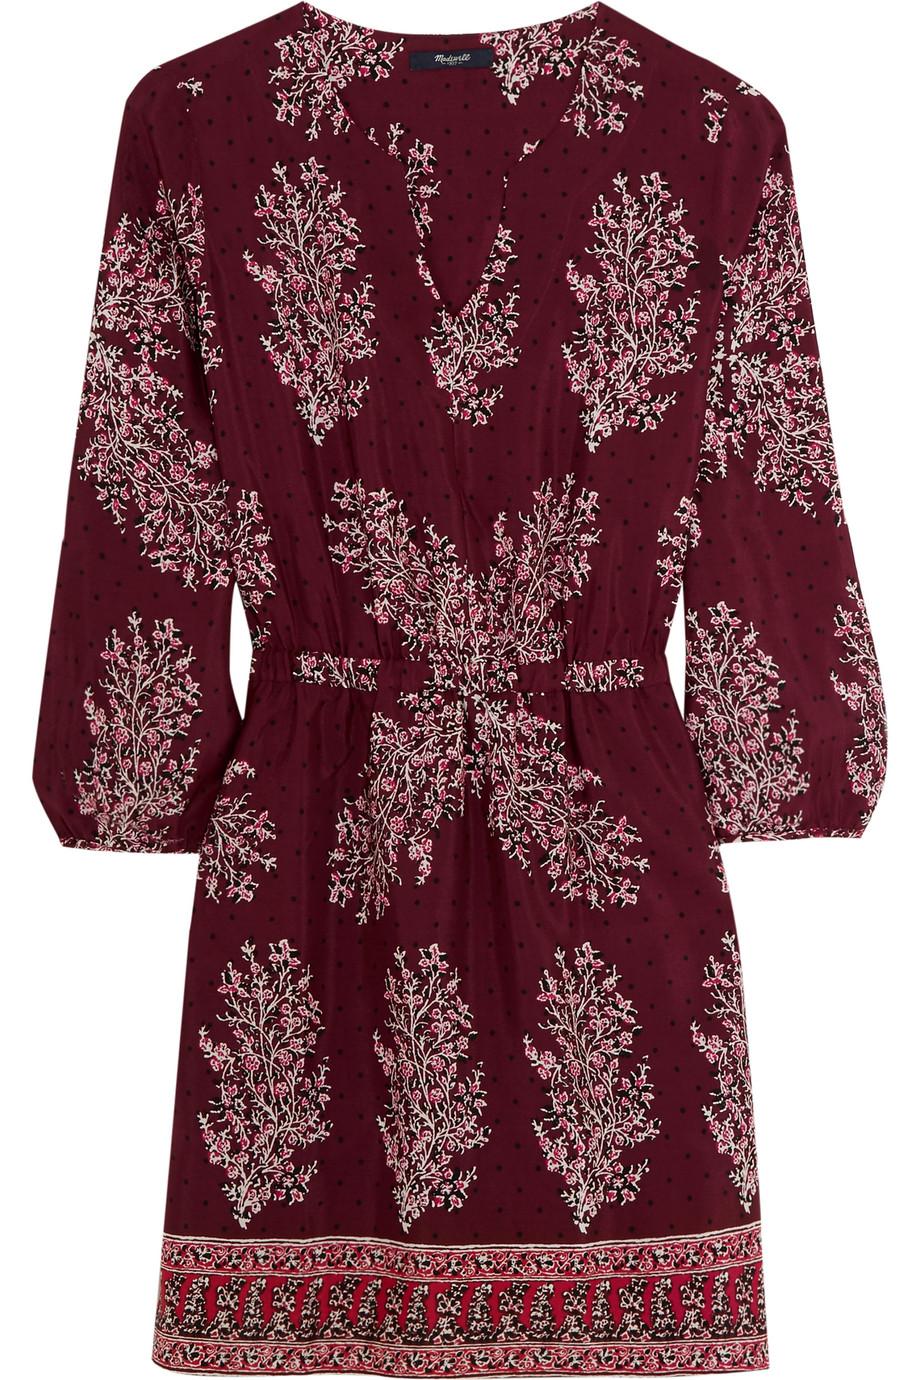 Madewell Printed Silk Crepe De Chine Mini Dress, Burgundy, Women's - Printed, Size: 0